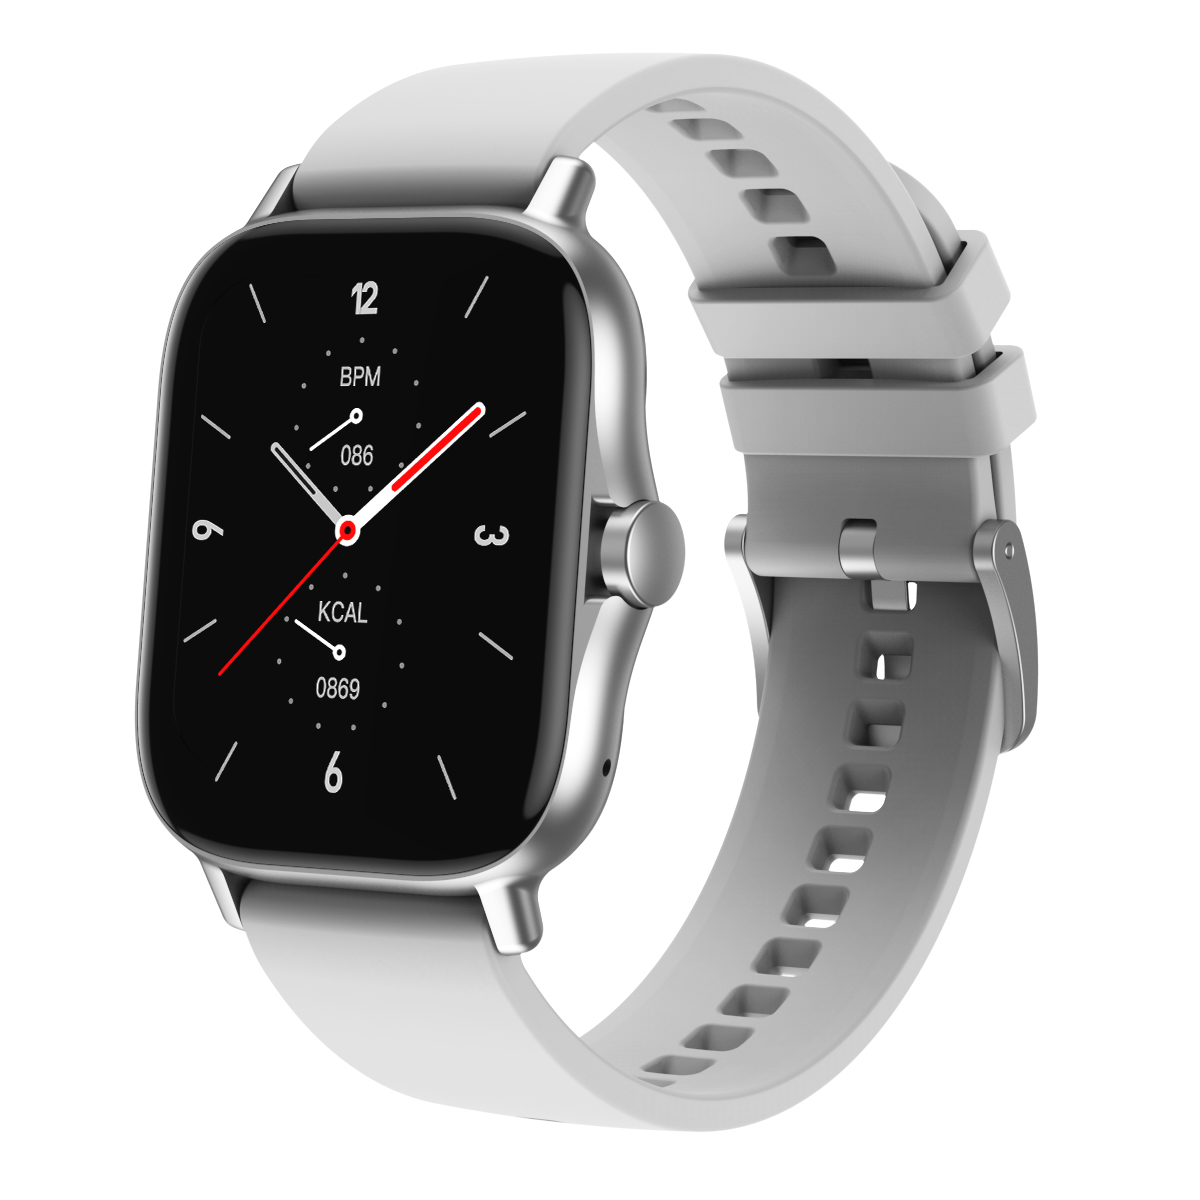 Dw11 Smart  Watch Heart Rate Blood Pressure Bluetooth Call 1.63 Hd Full-screen Multi-sport Watch gray